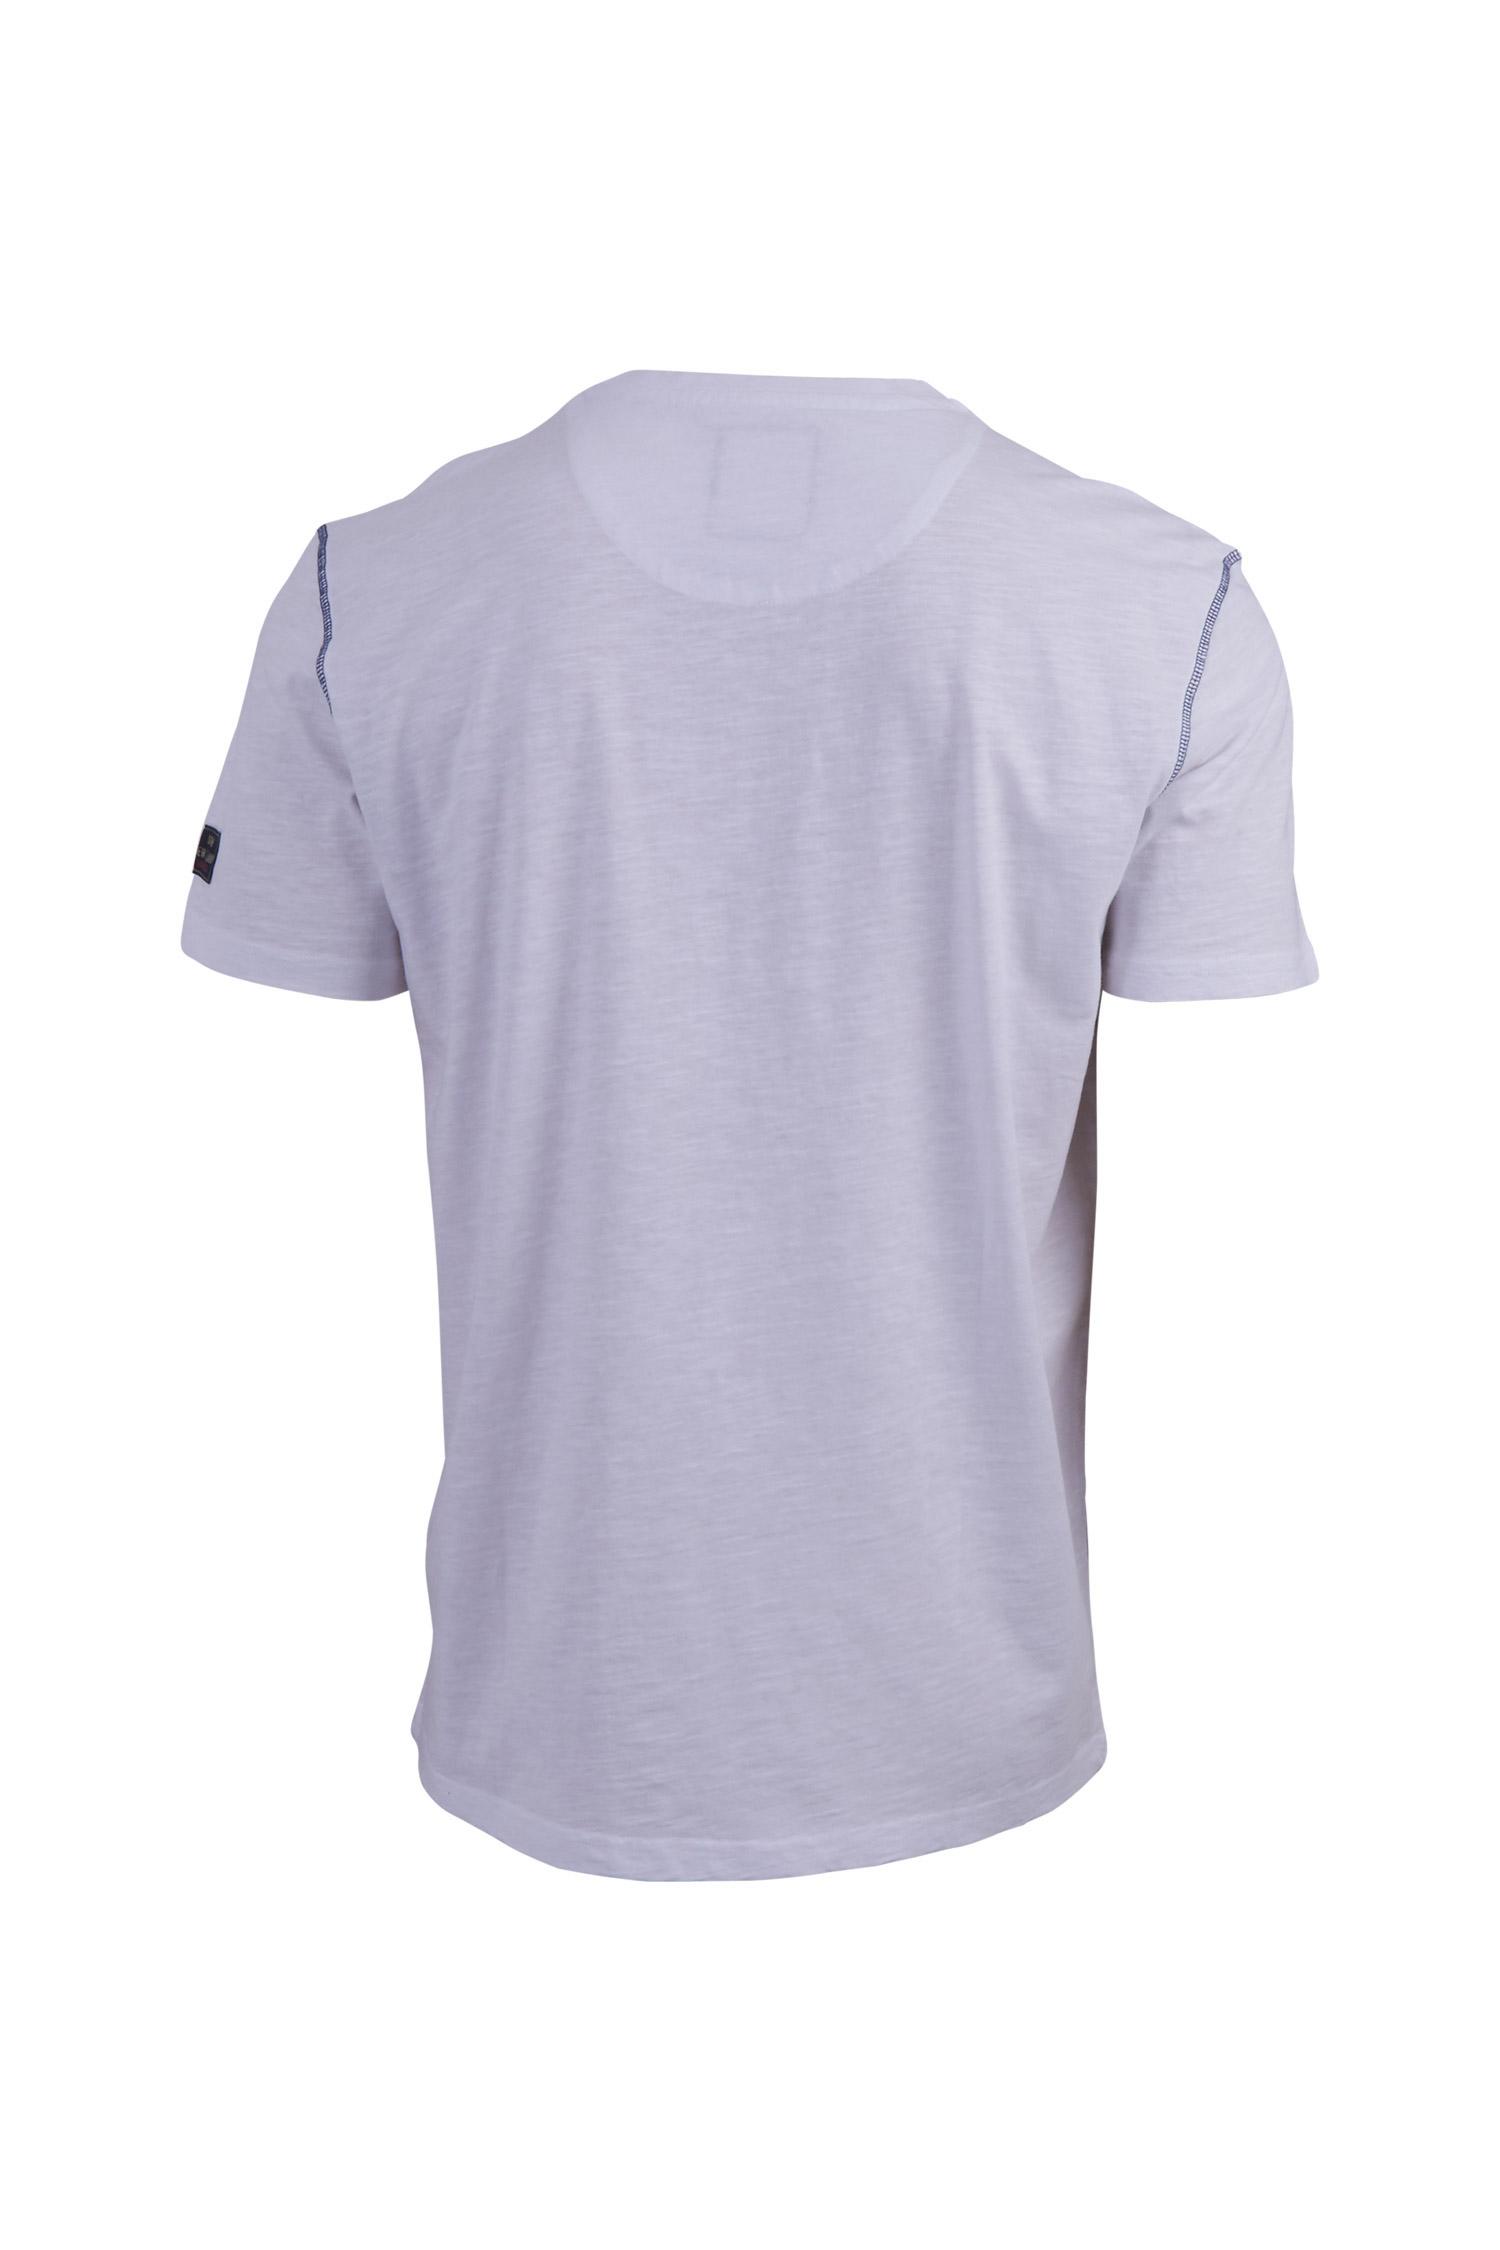 Sport, Camisetas M. Corta, 109151, BLANCO | Zoom